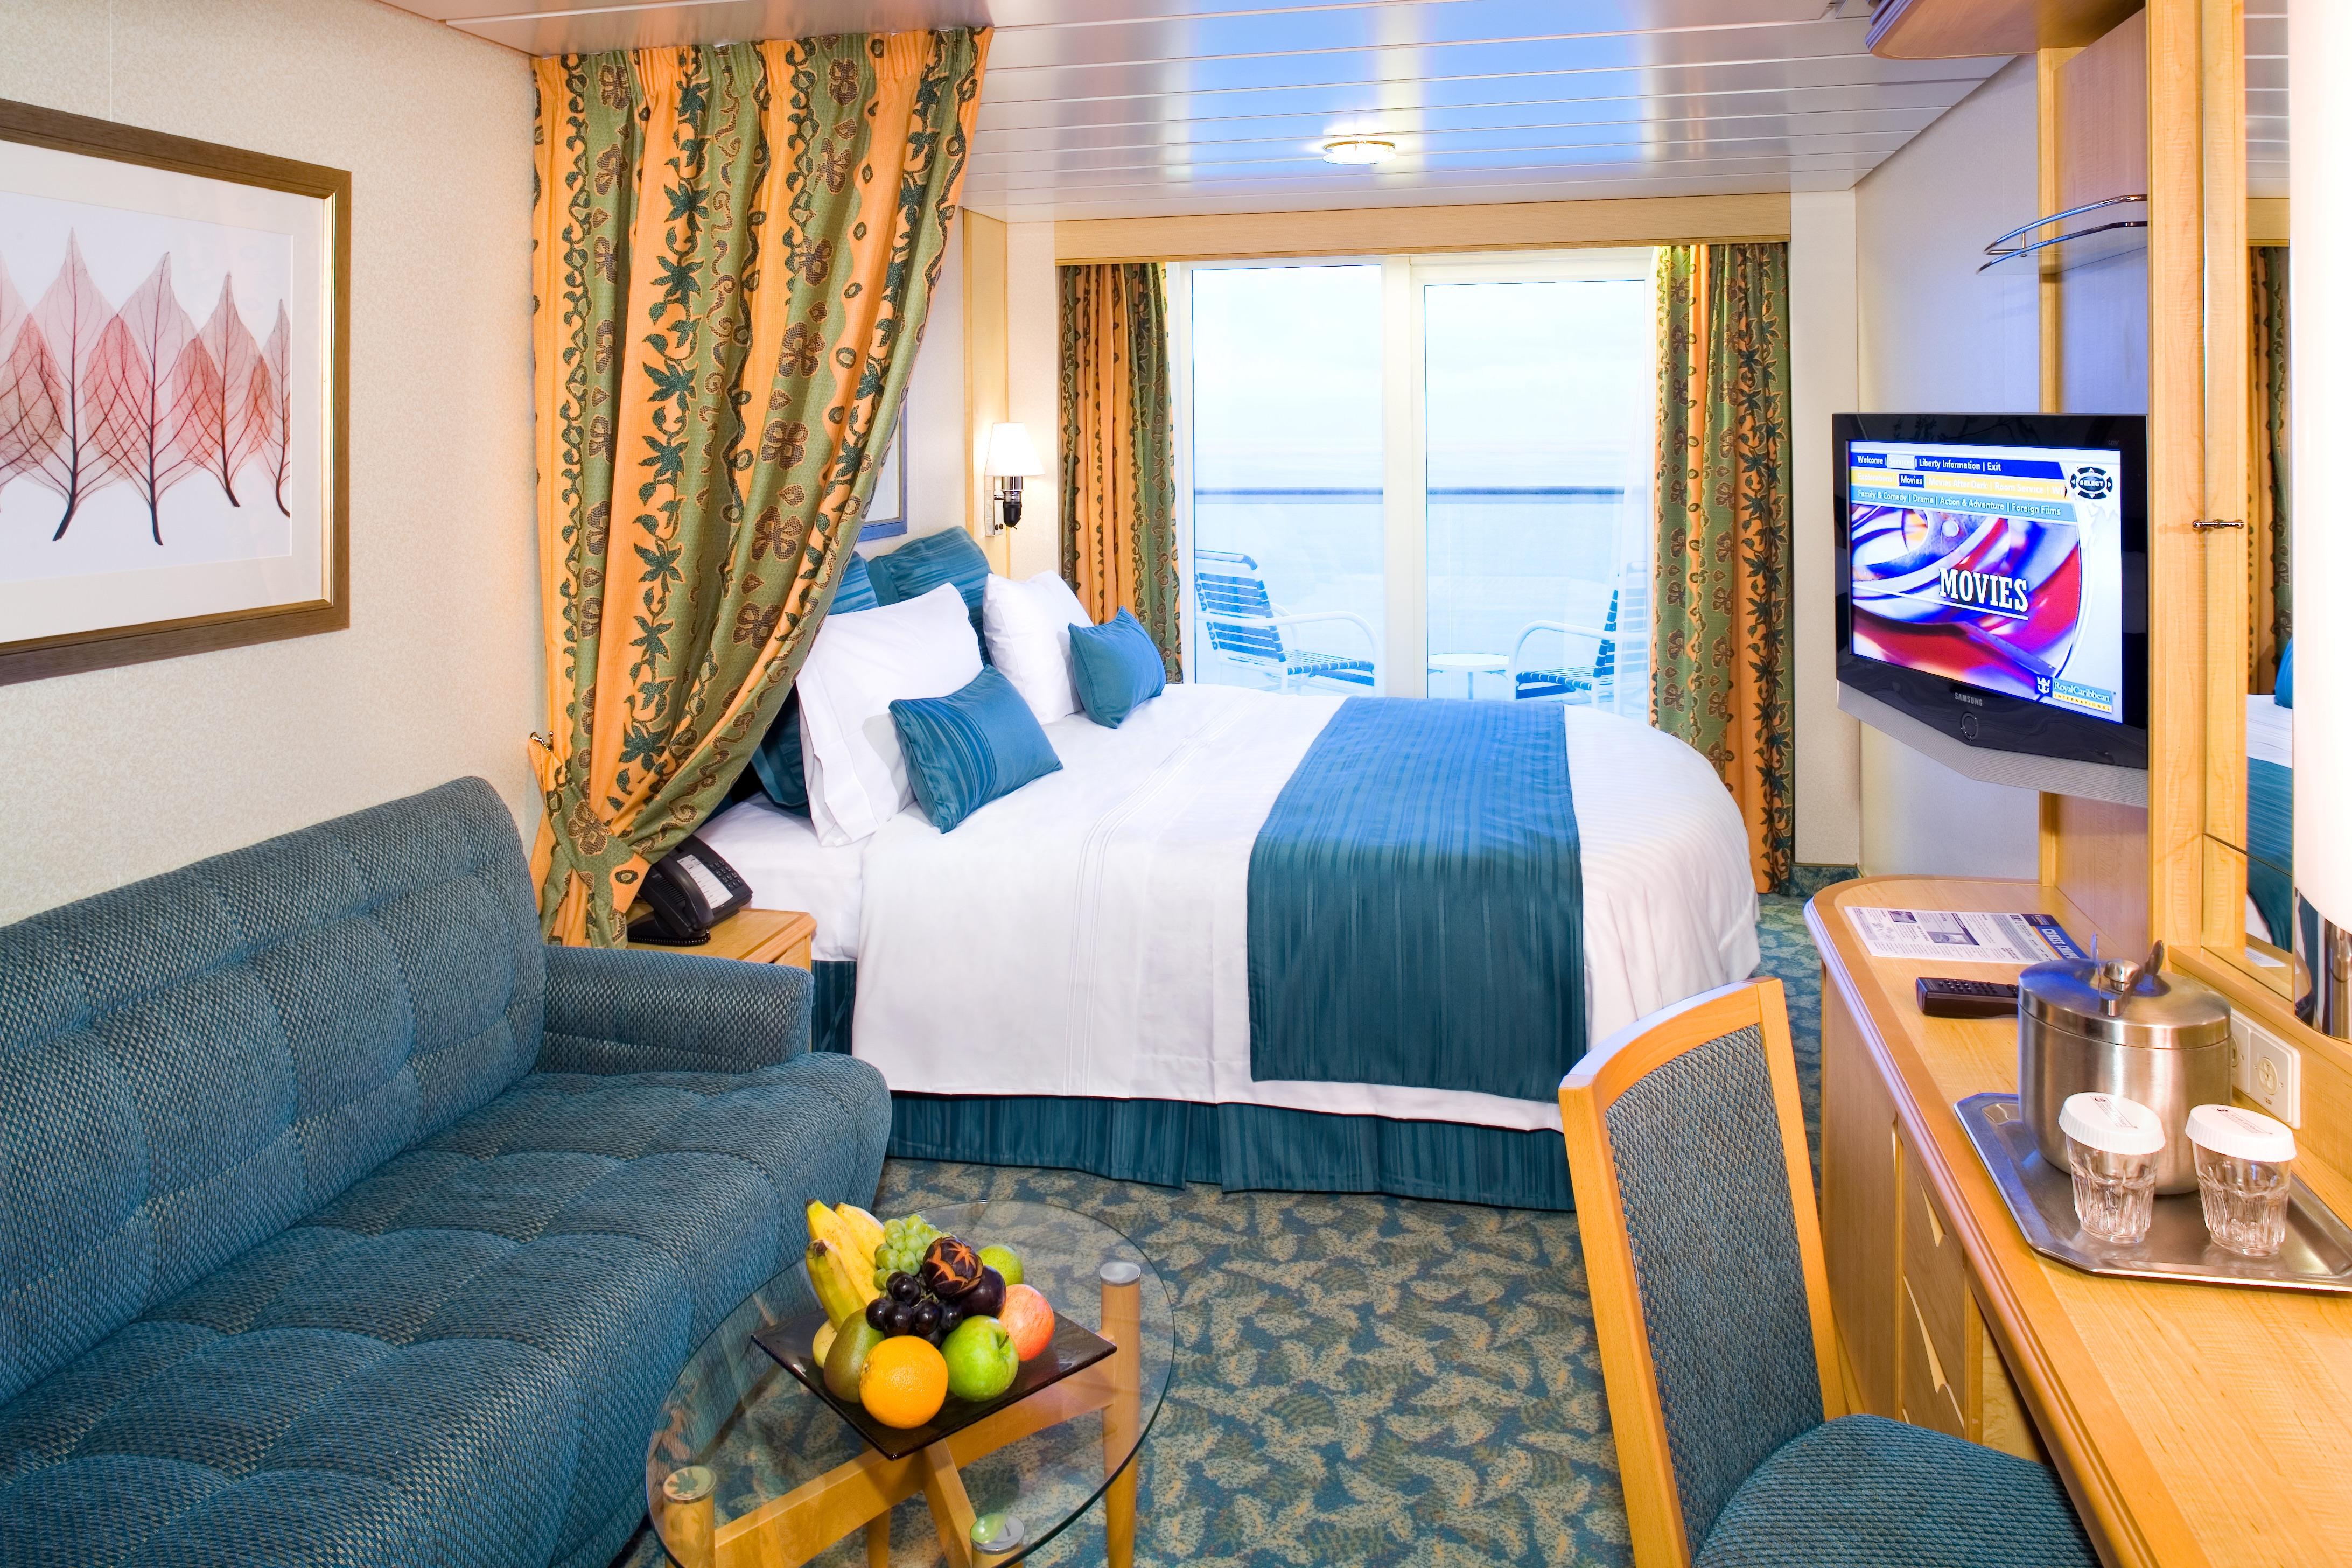 Royal Caribbean International Liberty of the seas Accommodation Oceanview CatE1.jpeg